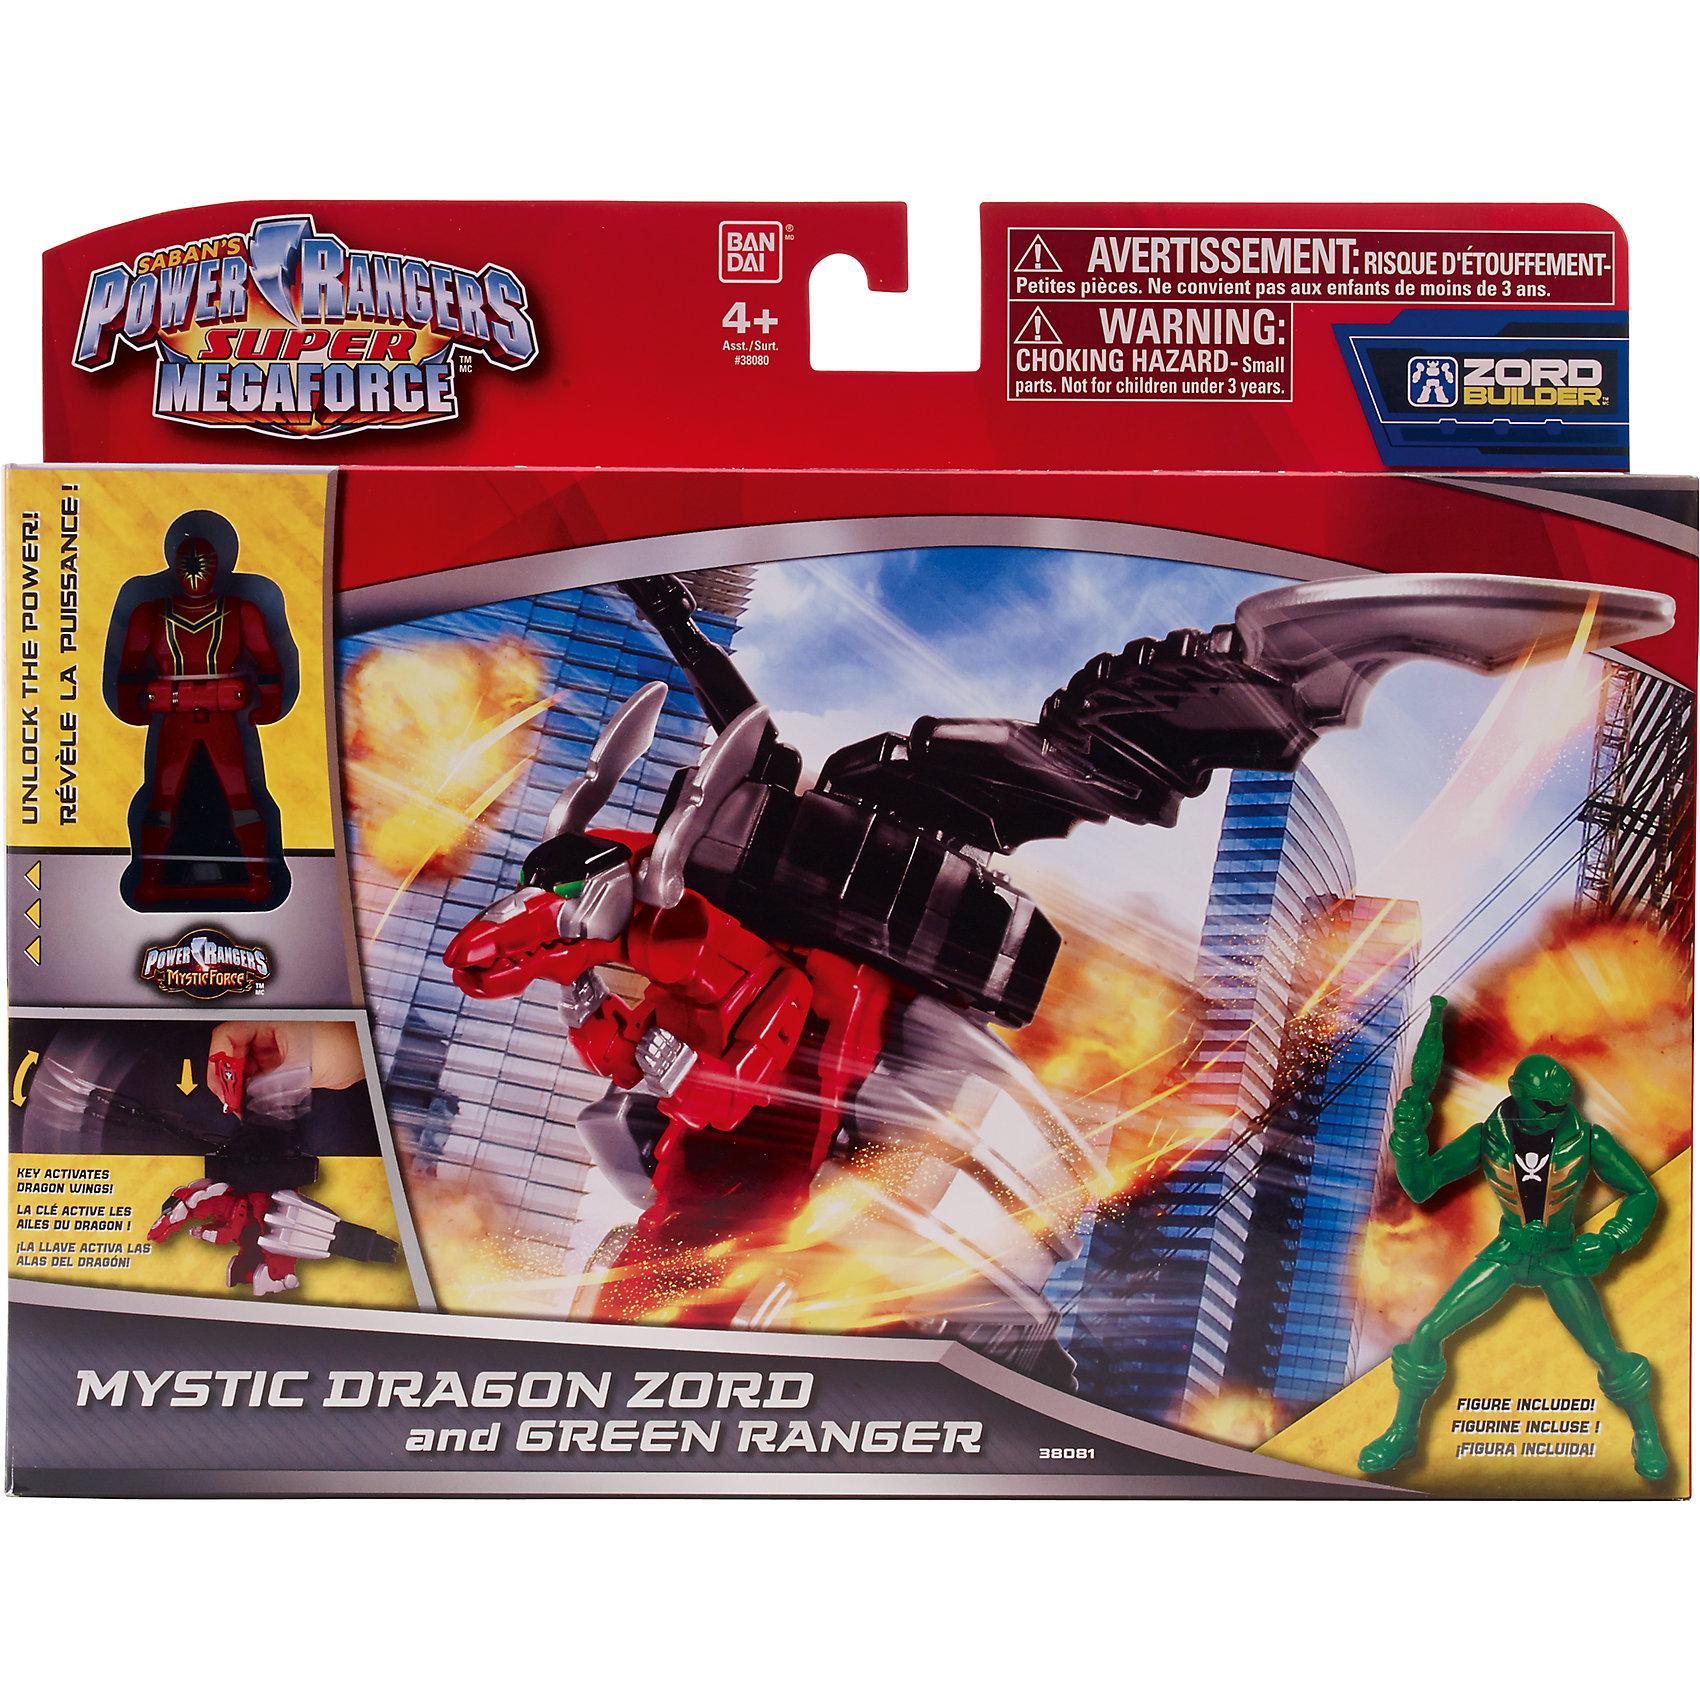 BANDAI Набор Зорда и фигурки рейнджера, Power Rangers bandai bandai power rangers игровой набор могучие рейнджеры рейнджер с оружием